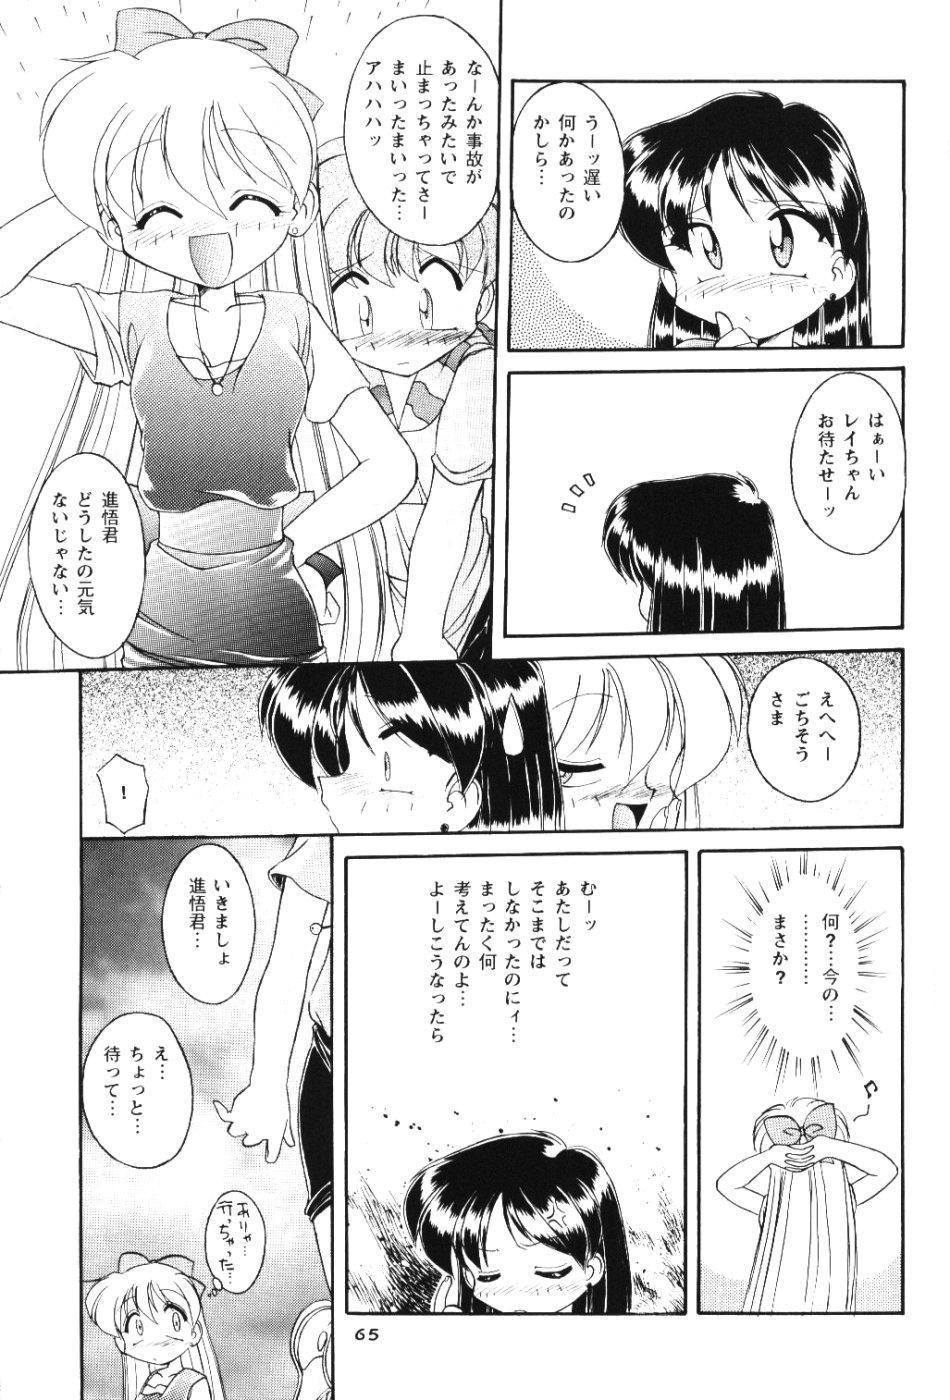 Moon Memories Vol. 2 63